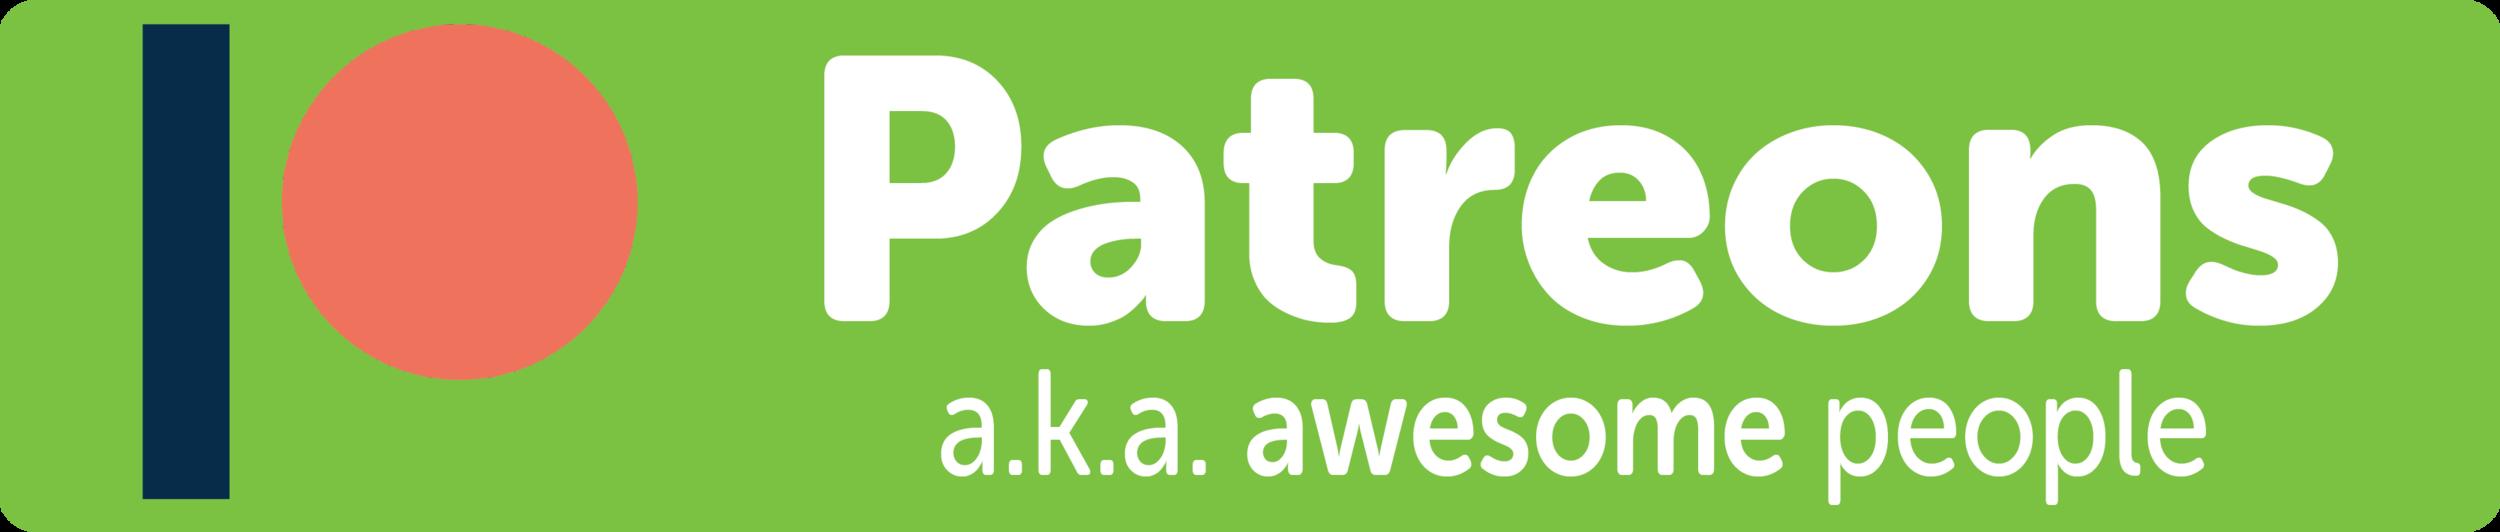 patreons.png